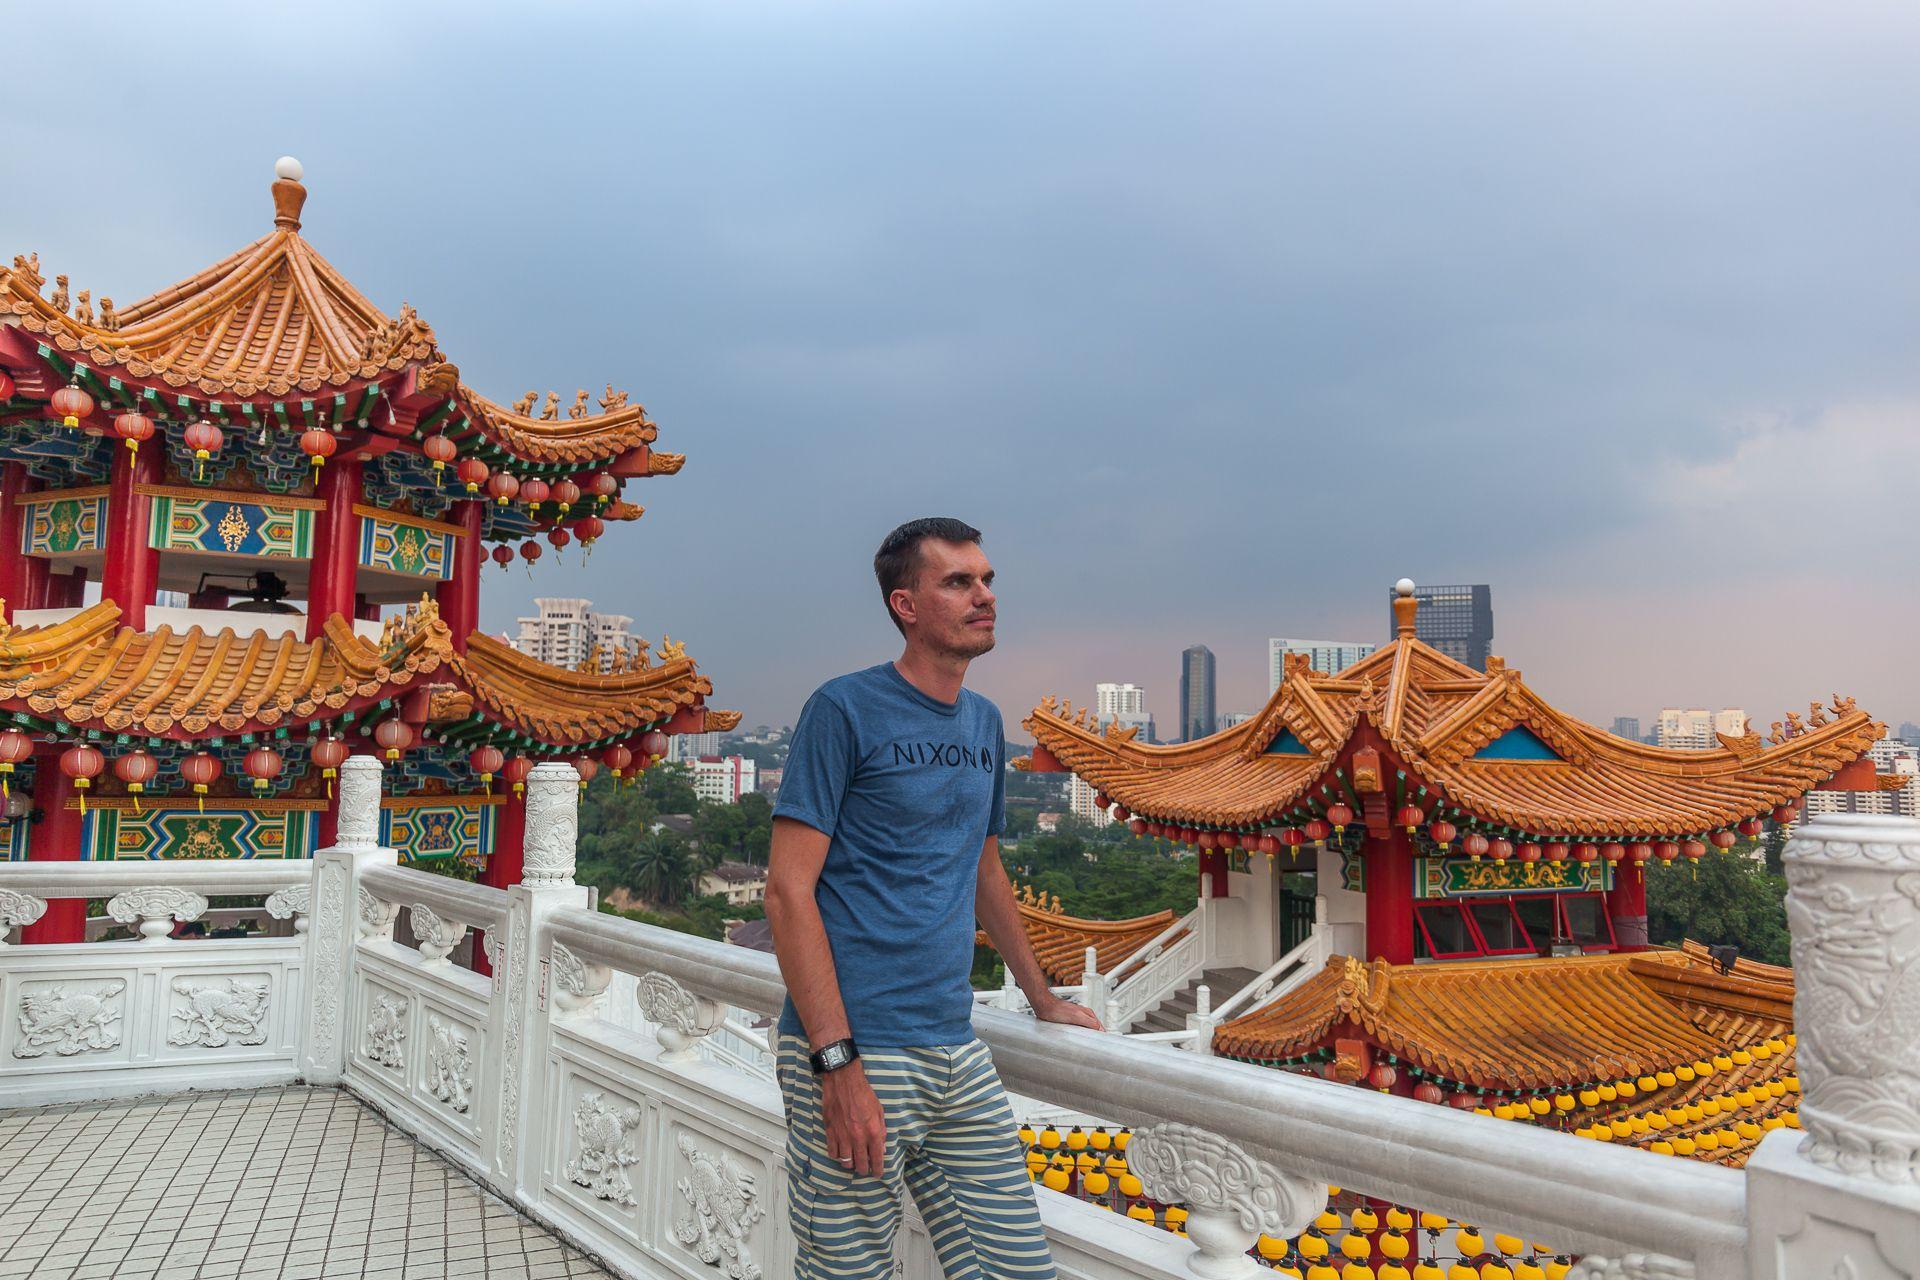 KL, Kuala-Lumpur, Malaysia, Kuala-Lumpur, Malaysia, Куала-Лумпур, Малайзия, Столица Малайзии, что посмотреть в Куала-Лумпуре, Куала Лумпур достопримечательности, достопримечательности Куала-Лумпура, что стоит посетить в Куала-Лумпуре, китайский храм в Куала-лумпуре, дворец императора в Куала-Лумпуре, китайский храм Куала-Лумпур, фото Куала-Лумпура, дворец Тянь Хоу в Куала-Лумпуре, Thean Hou Temple, Тянь Хоу темпл